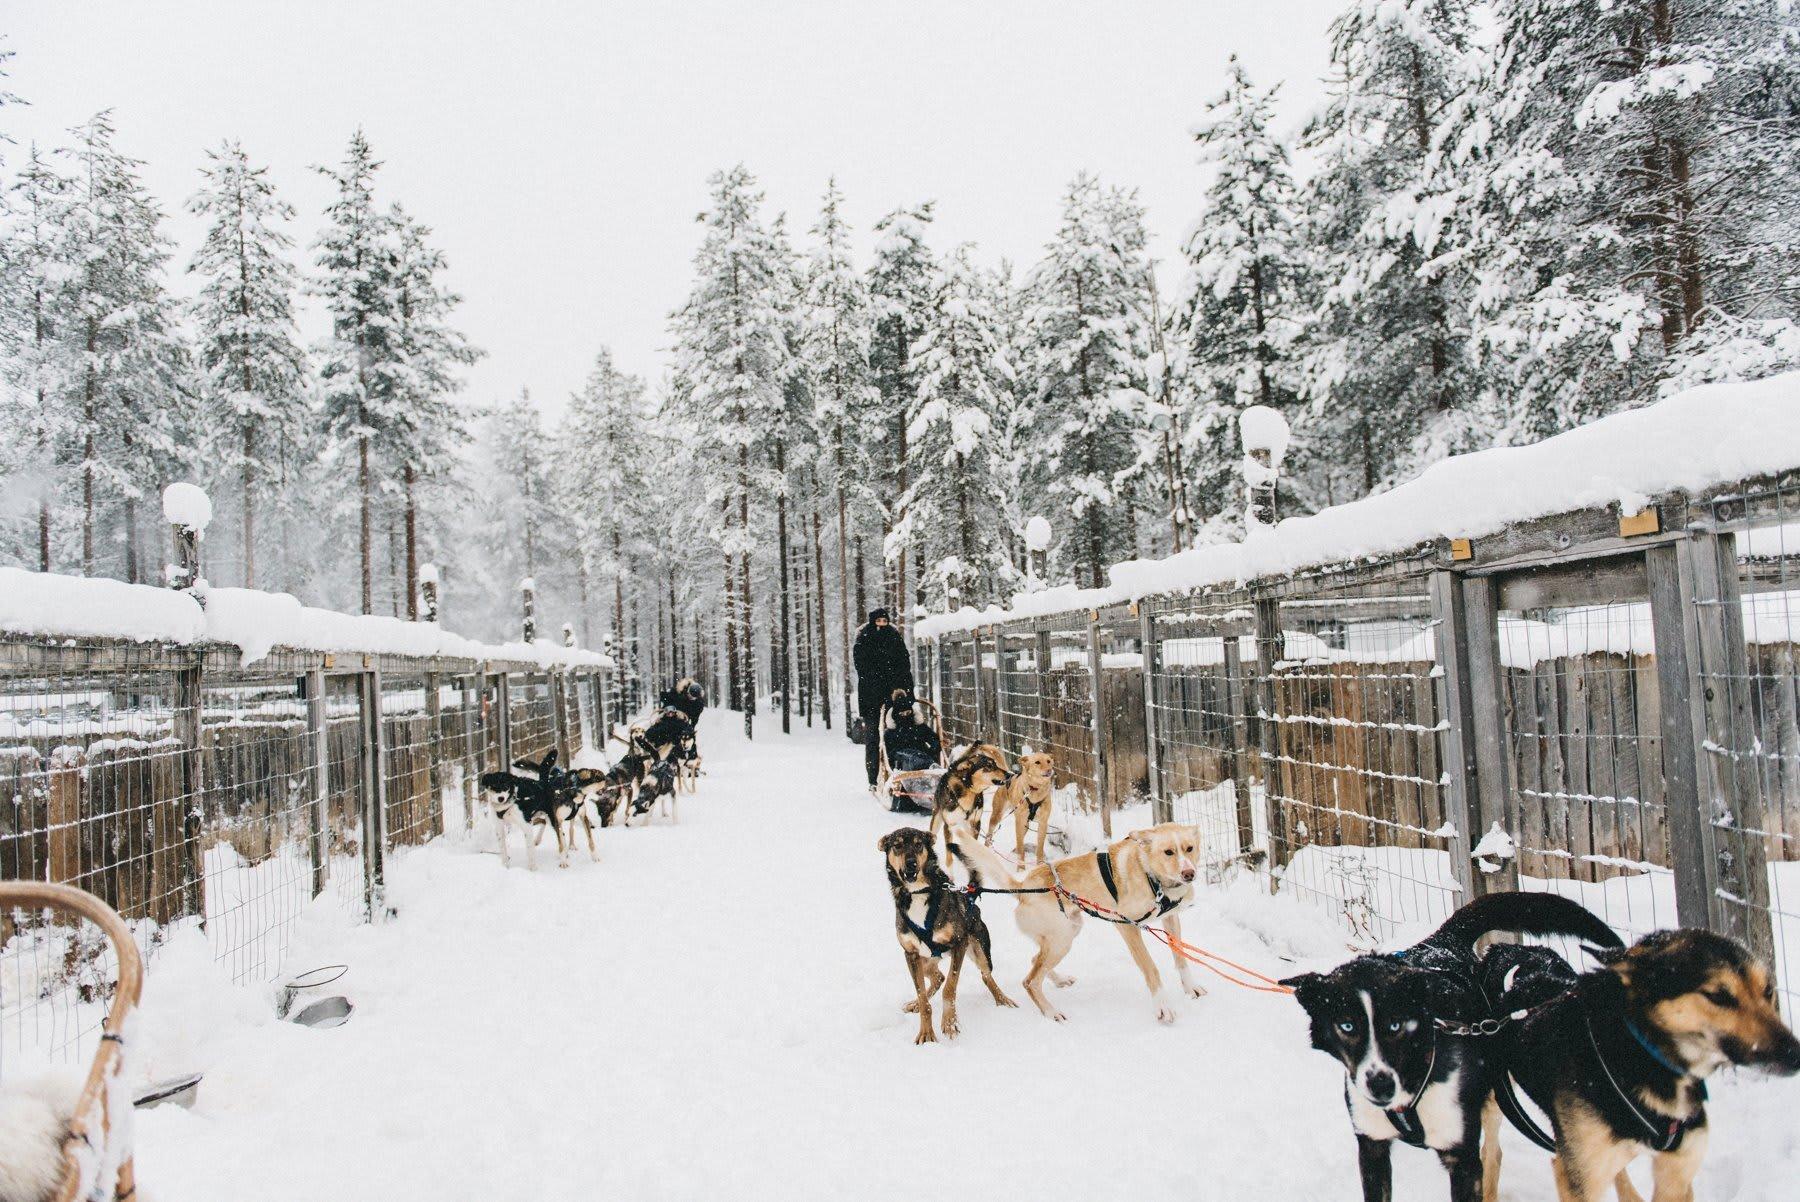 reisefotografie-lappland-finnland-158